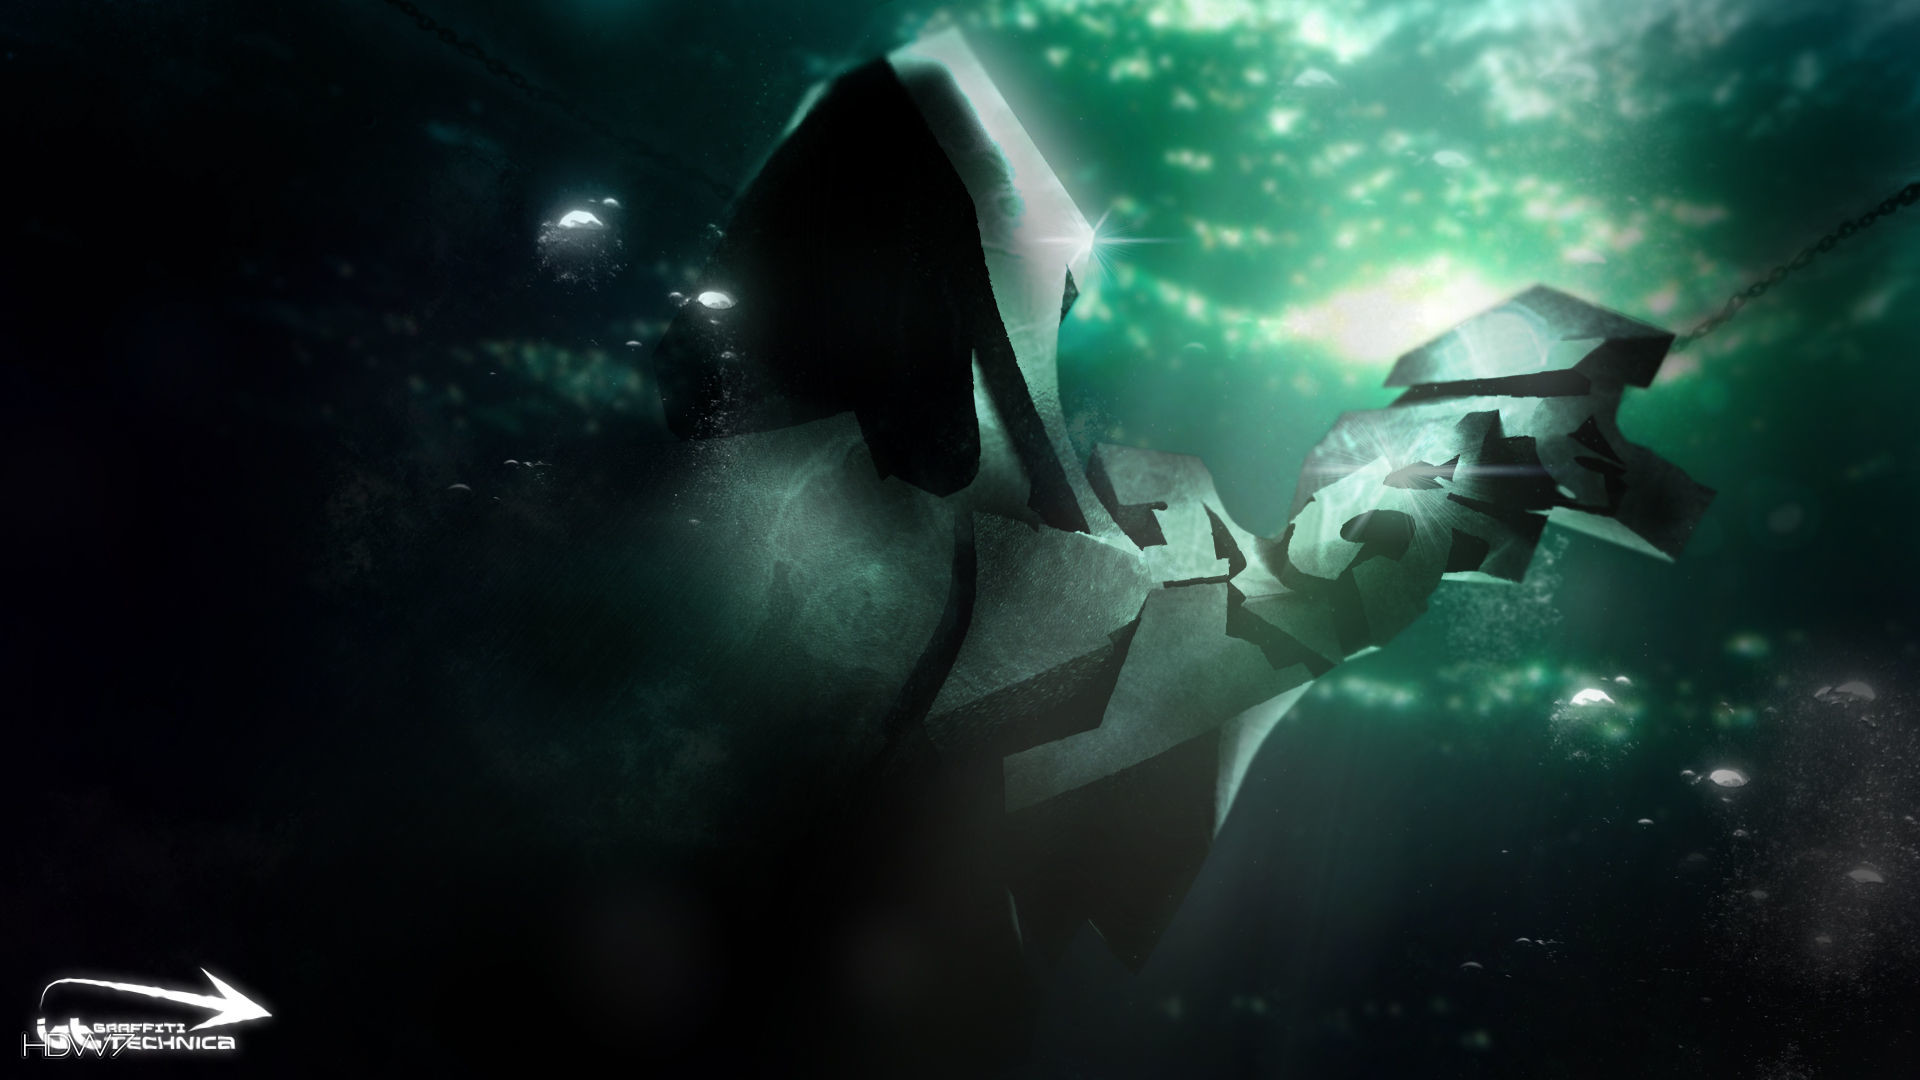 3d graffiti technica abstract green underwater